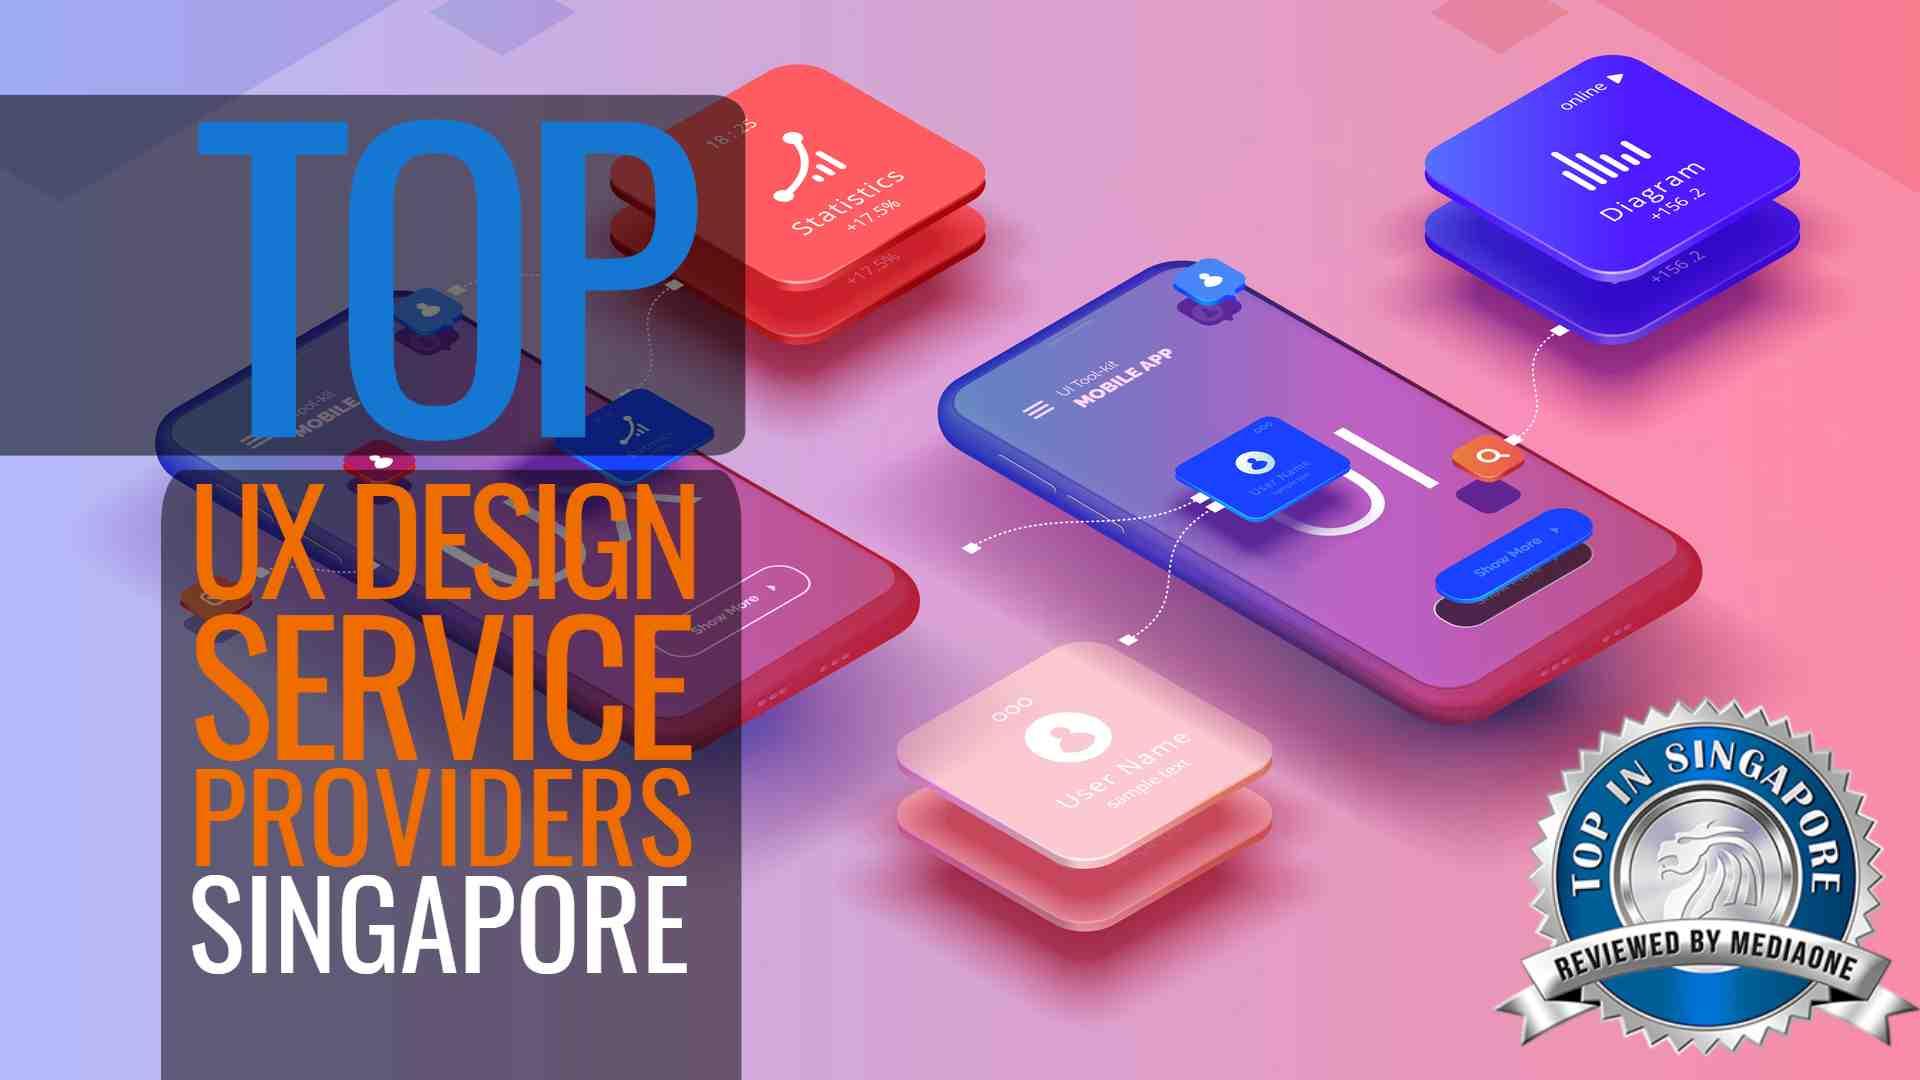 Top UX Design Service Providers in Singapore